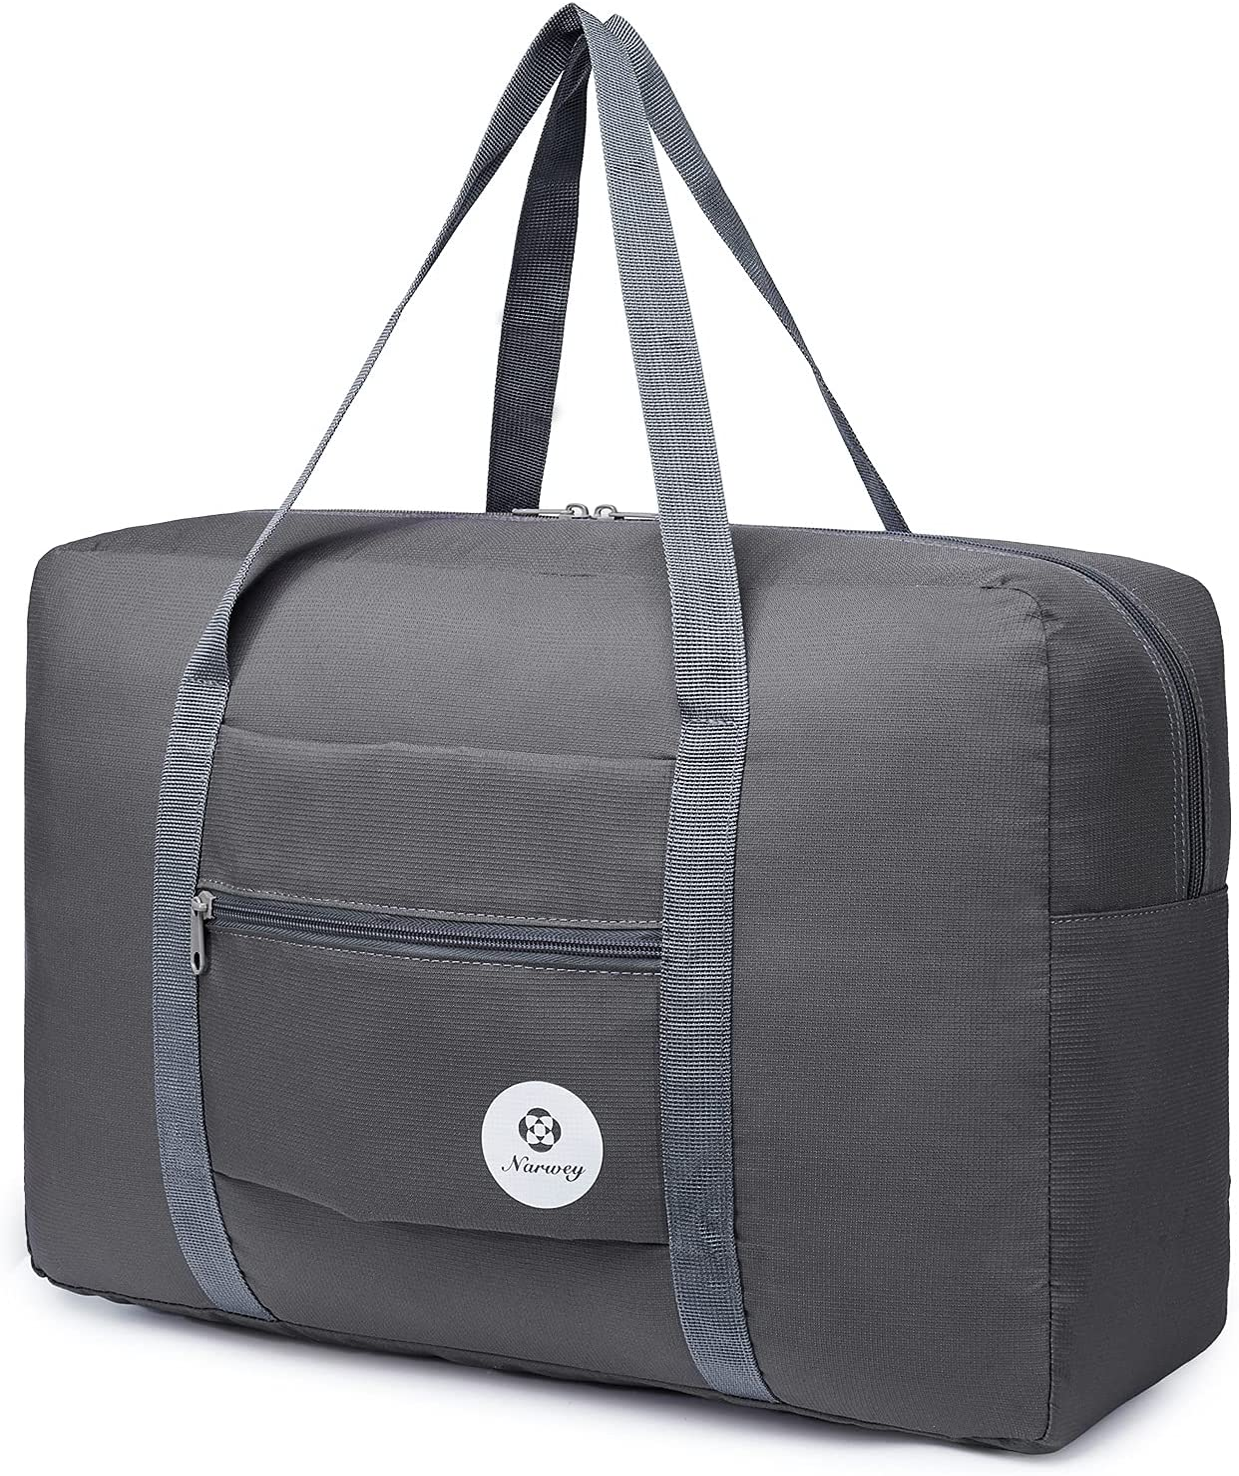 1. For Spirit Airlines Foldable Travel Duffel Bag